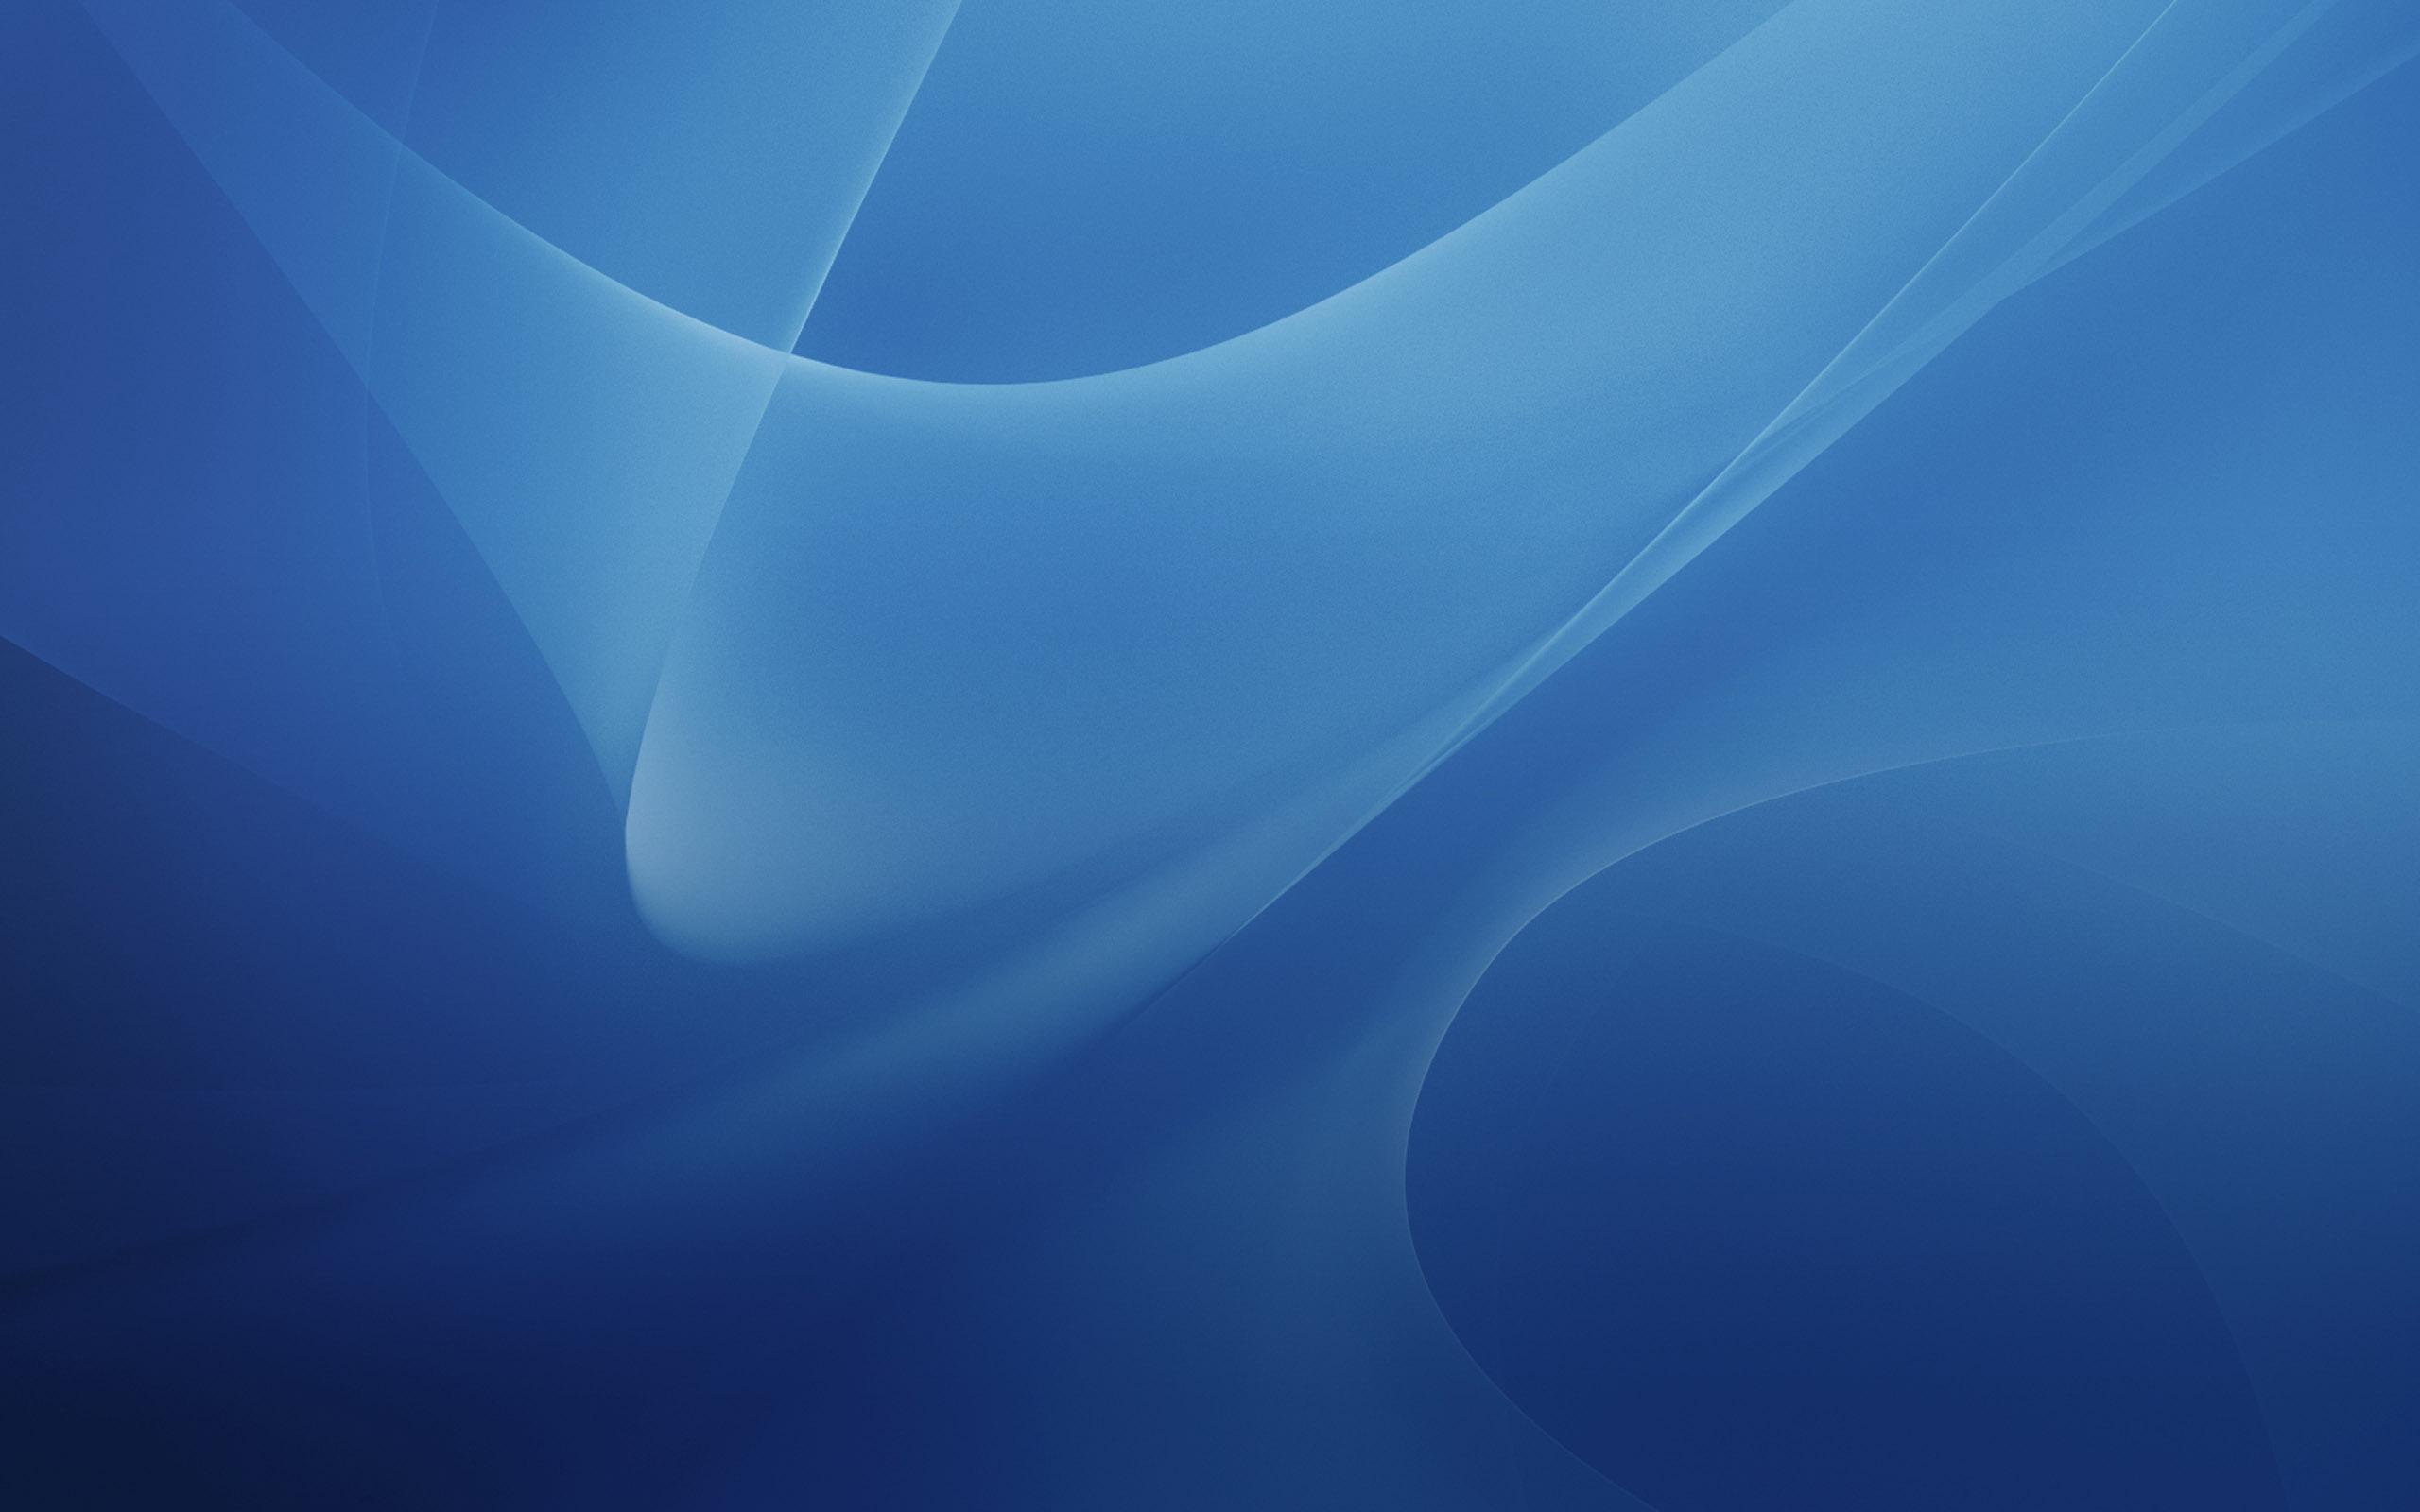 Stylish Wallpapers (HD Mac OS) Wallpaper Style Mac OS X